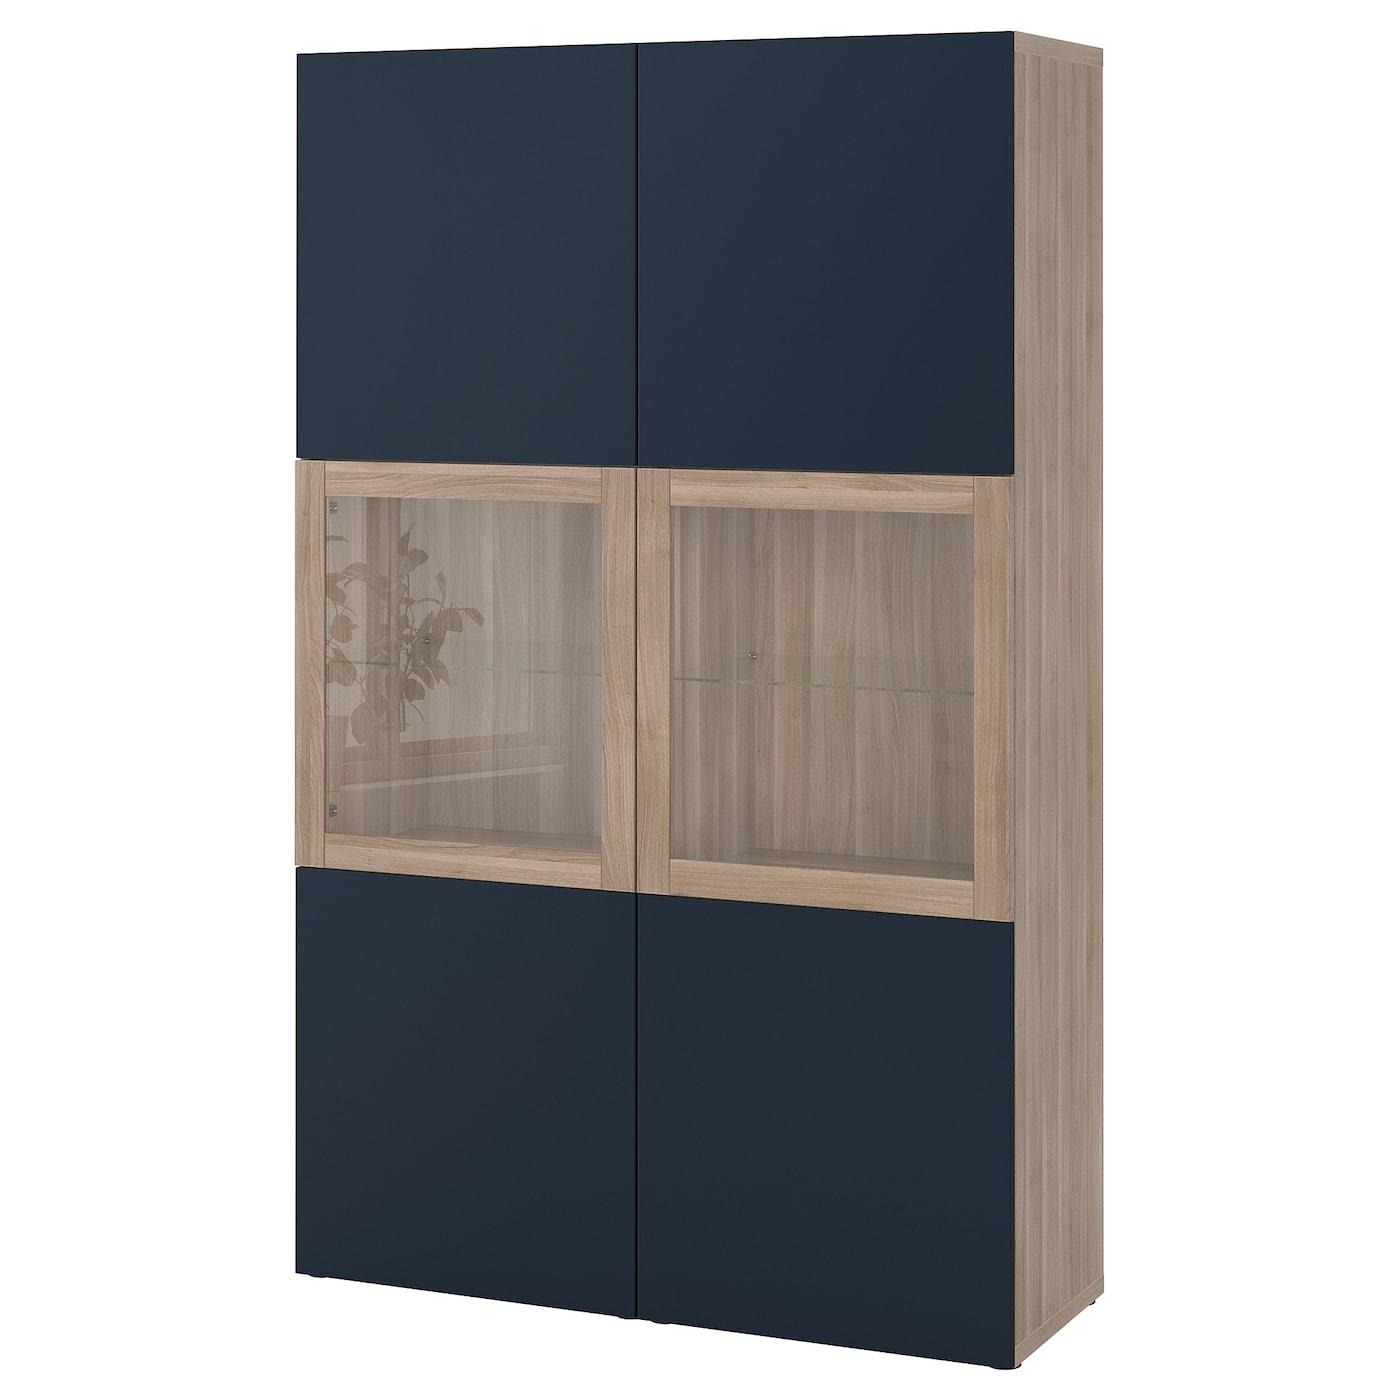 Storage Combination W Glass Doors Besta Grey Stained Walnut Effect Notviken Blue Clear Glass